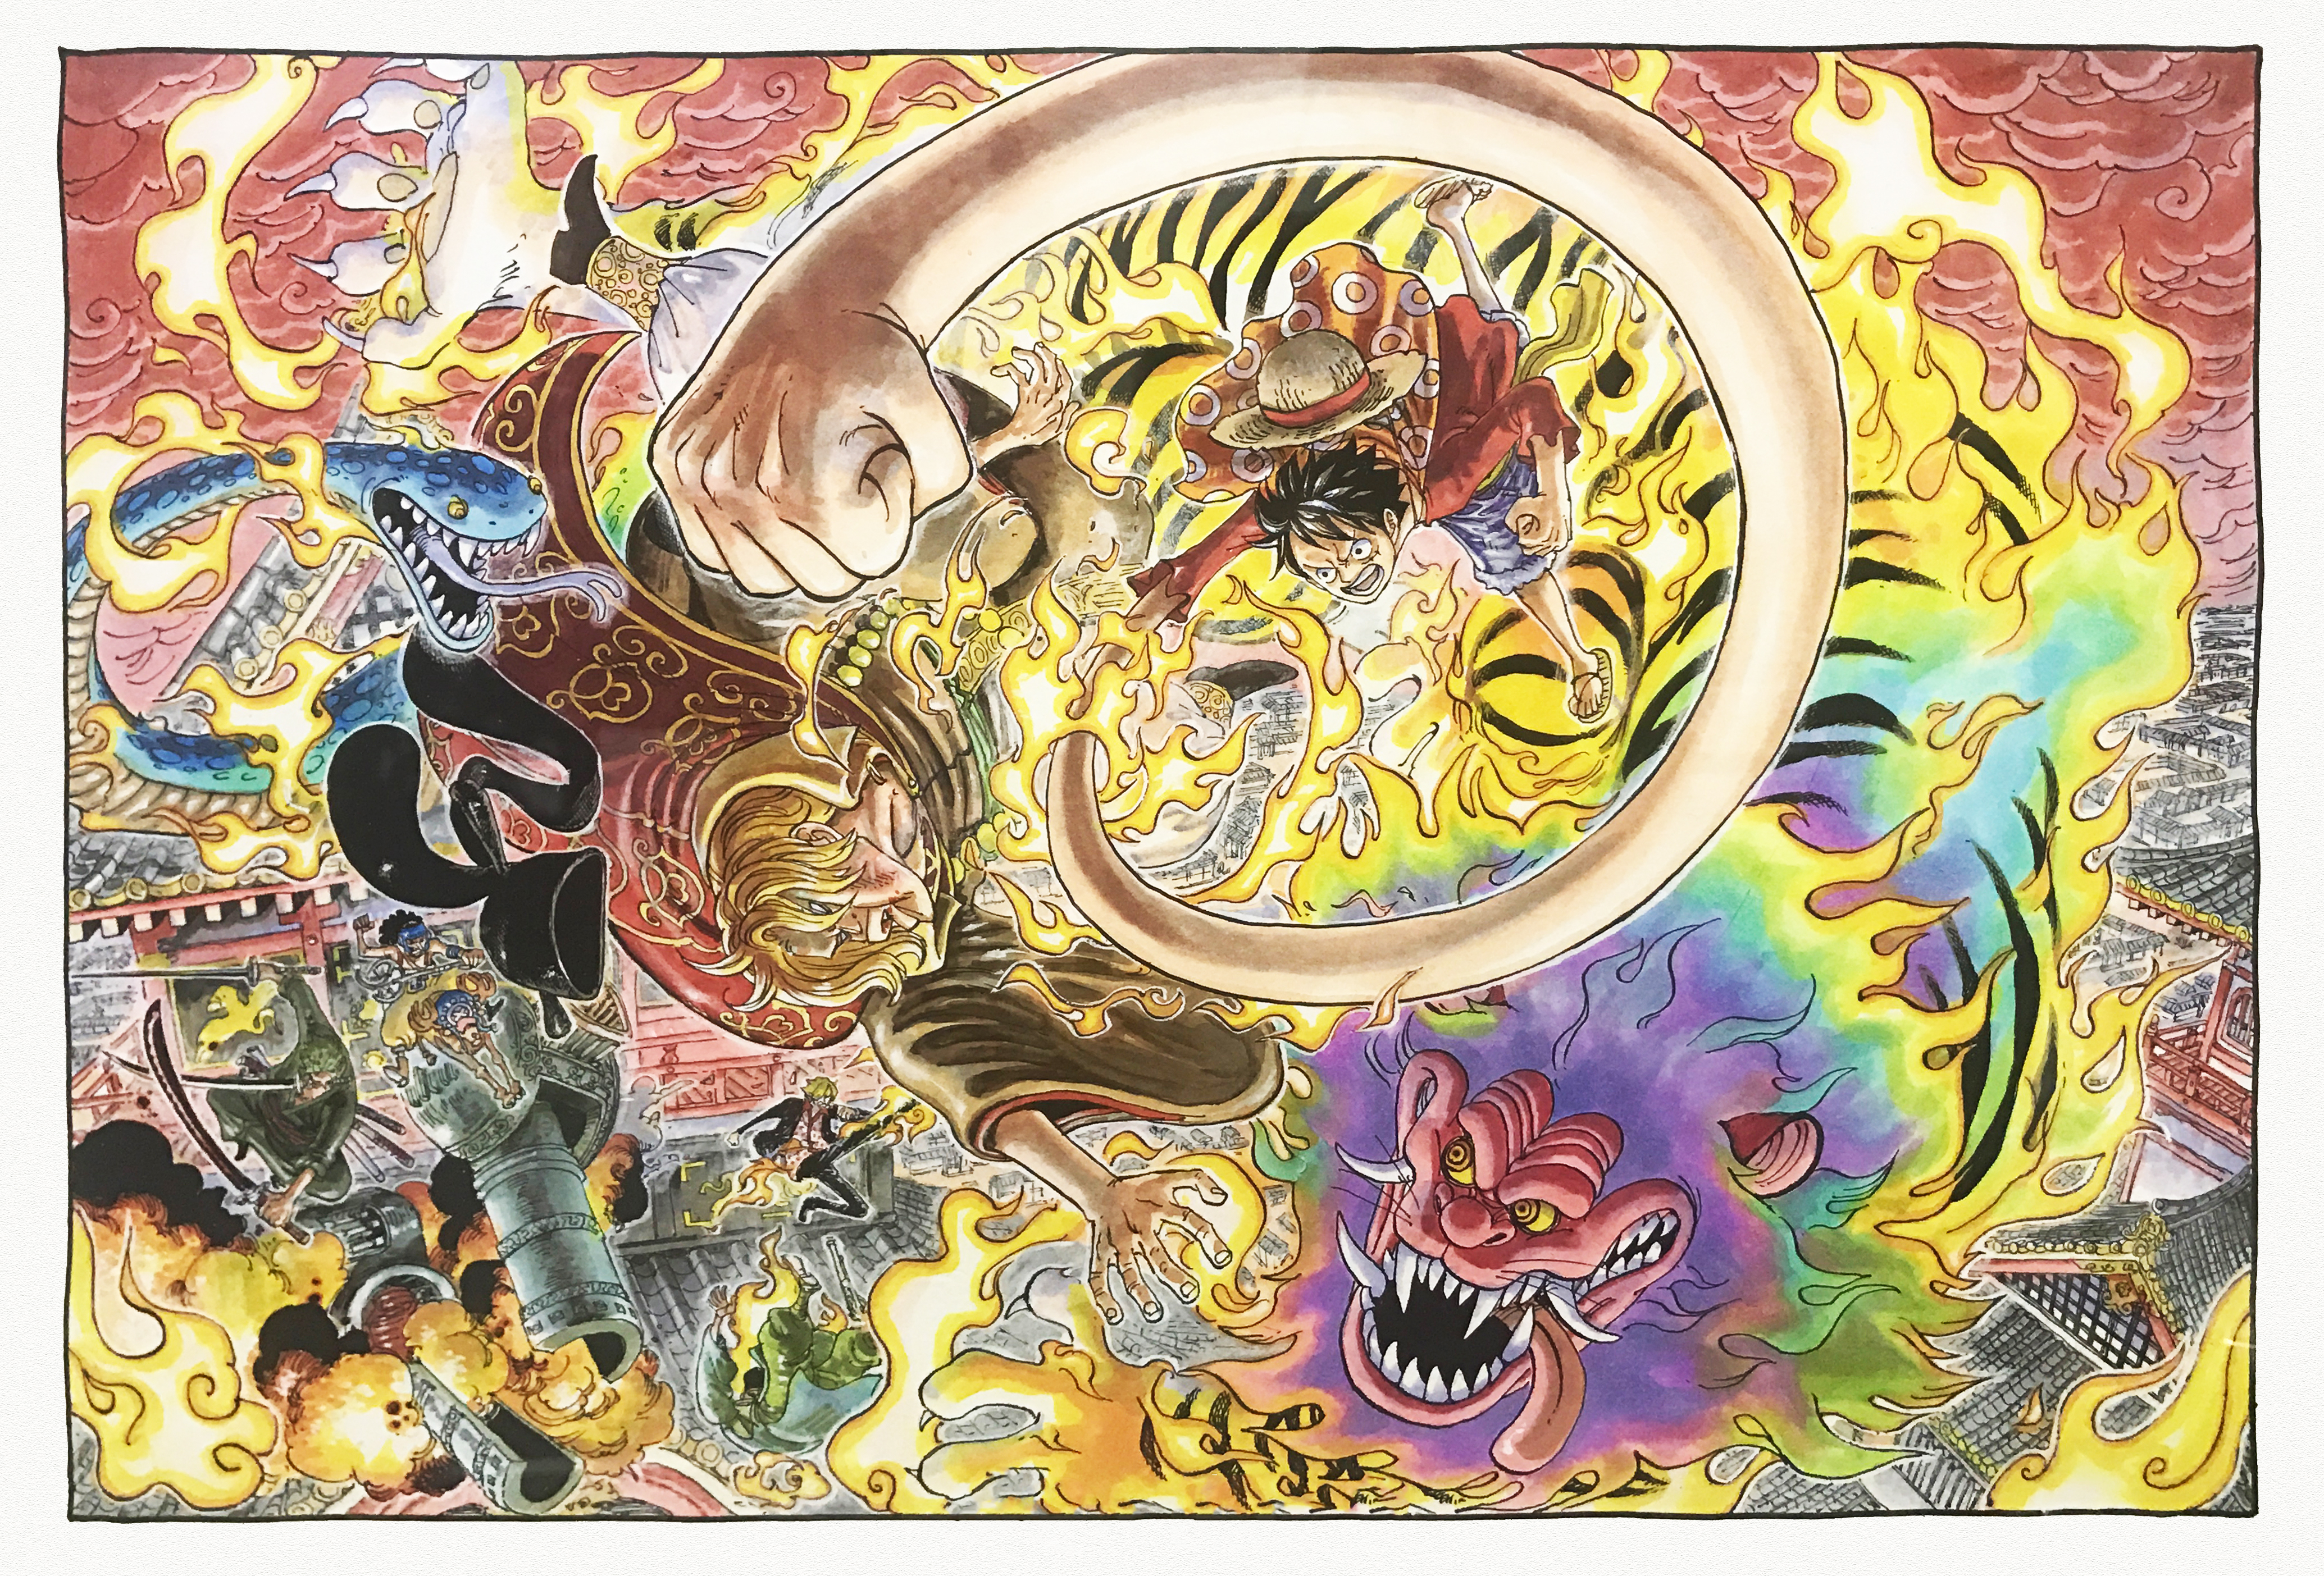 Wallpaper One Piece Zoro Wano